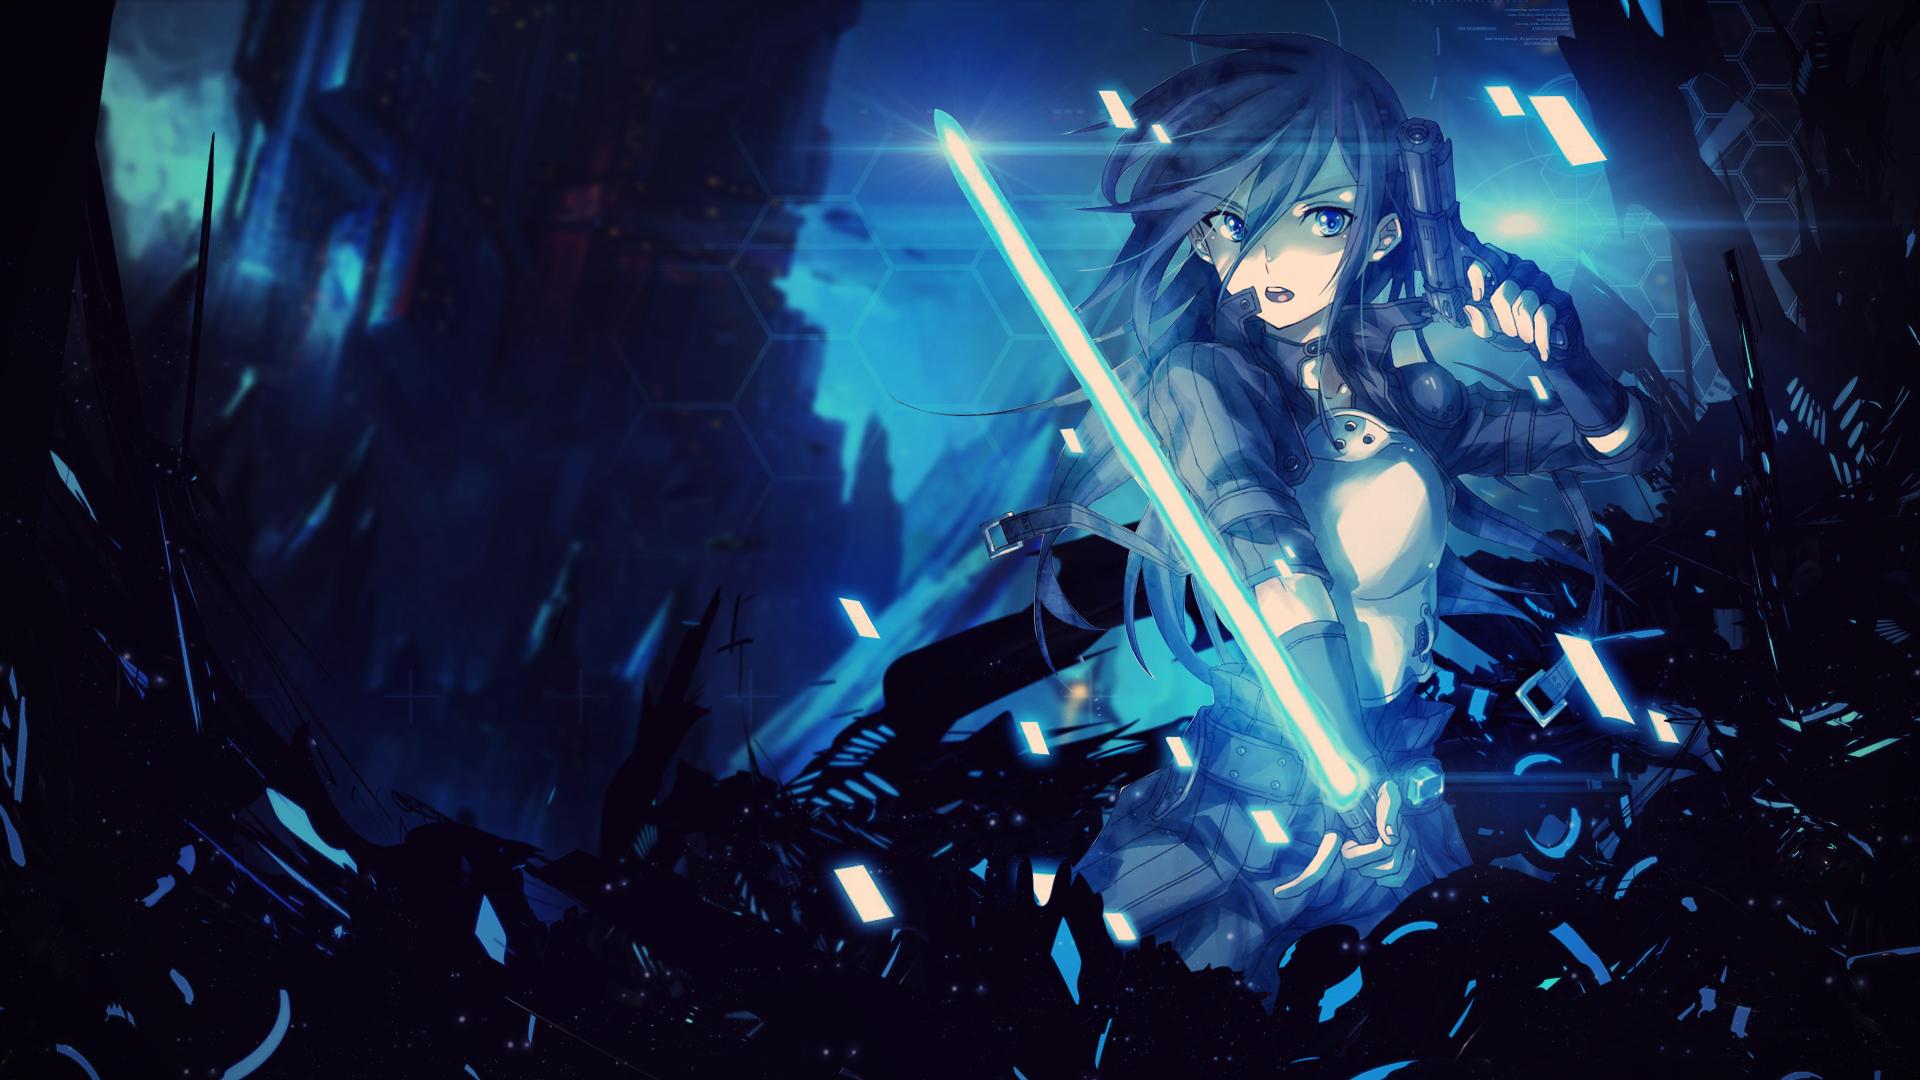 Sword Art Online - GGO Kirito Wallpaper by Trinexz